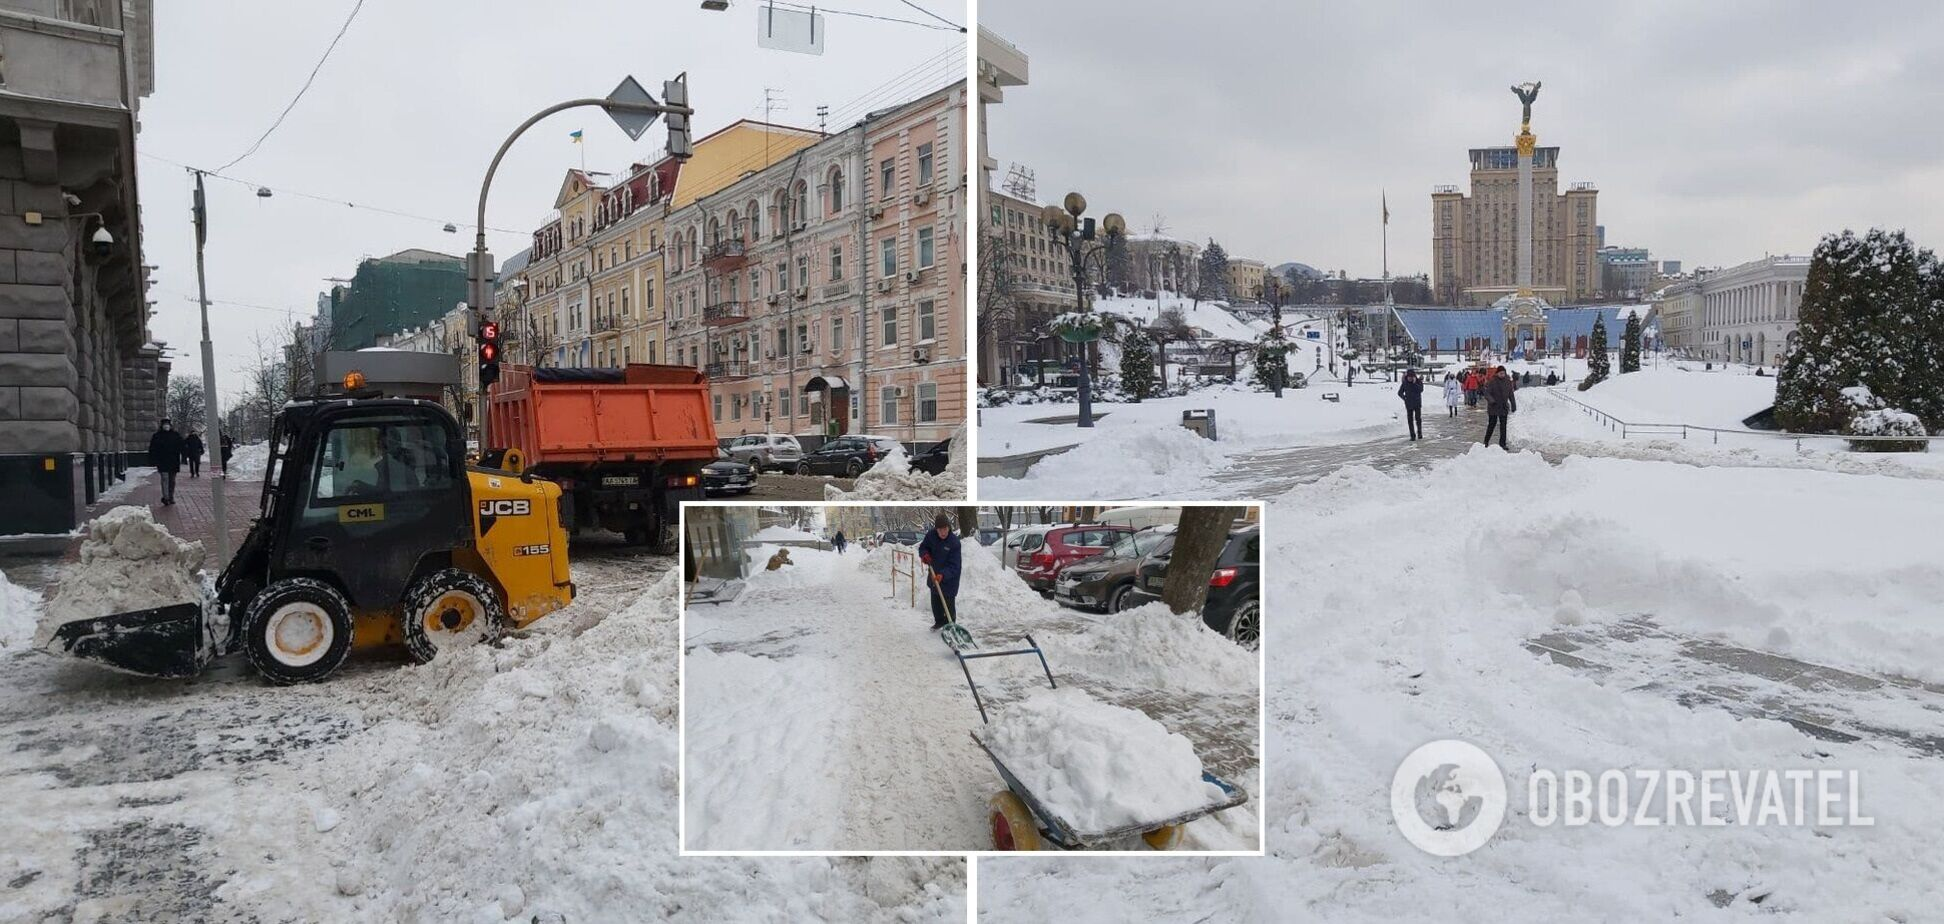 Много снега скопилось на краю проезжей части